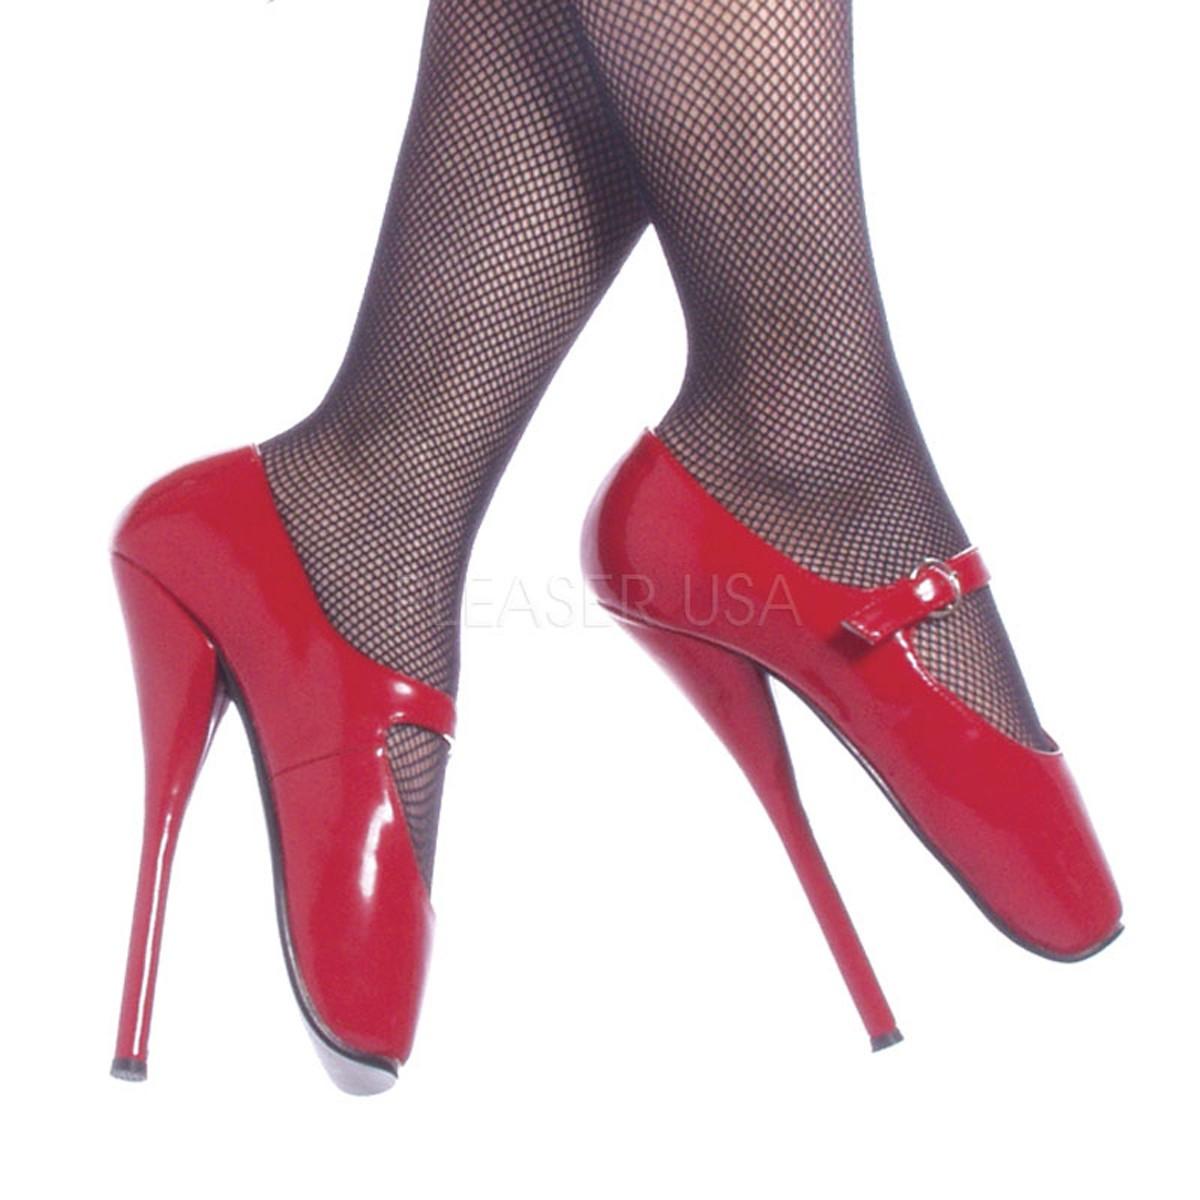 Devious Ballet-08 - extreme Fetisch High Heels 36-46